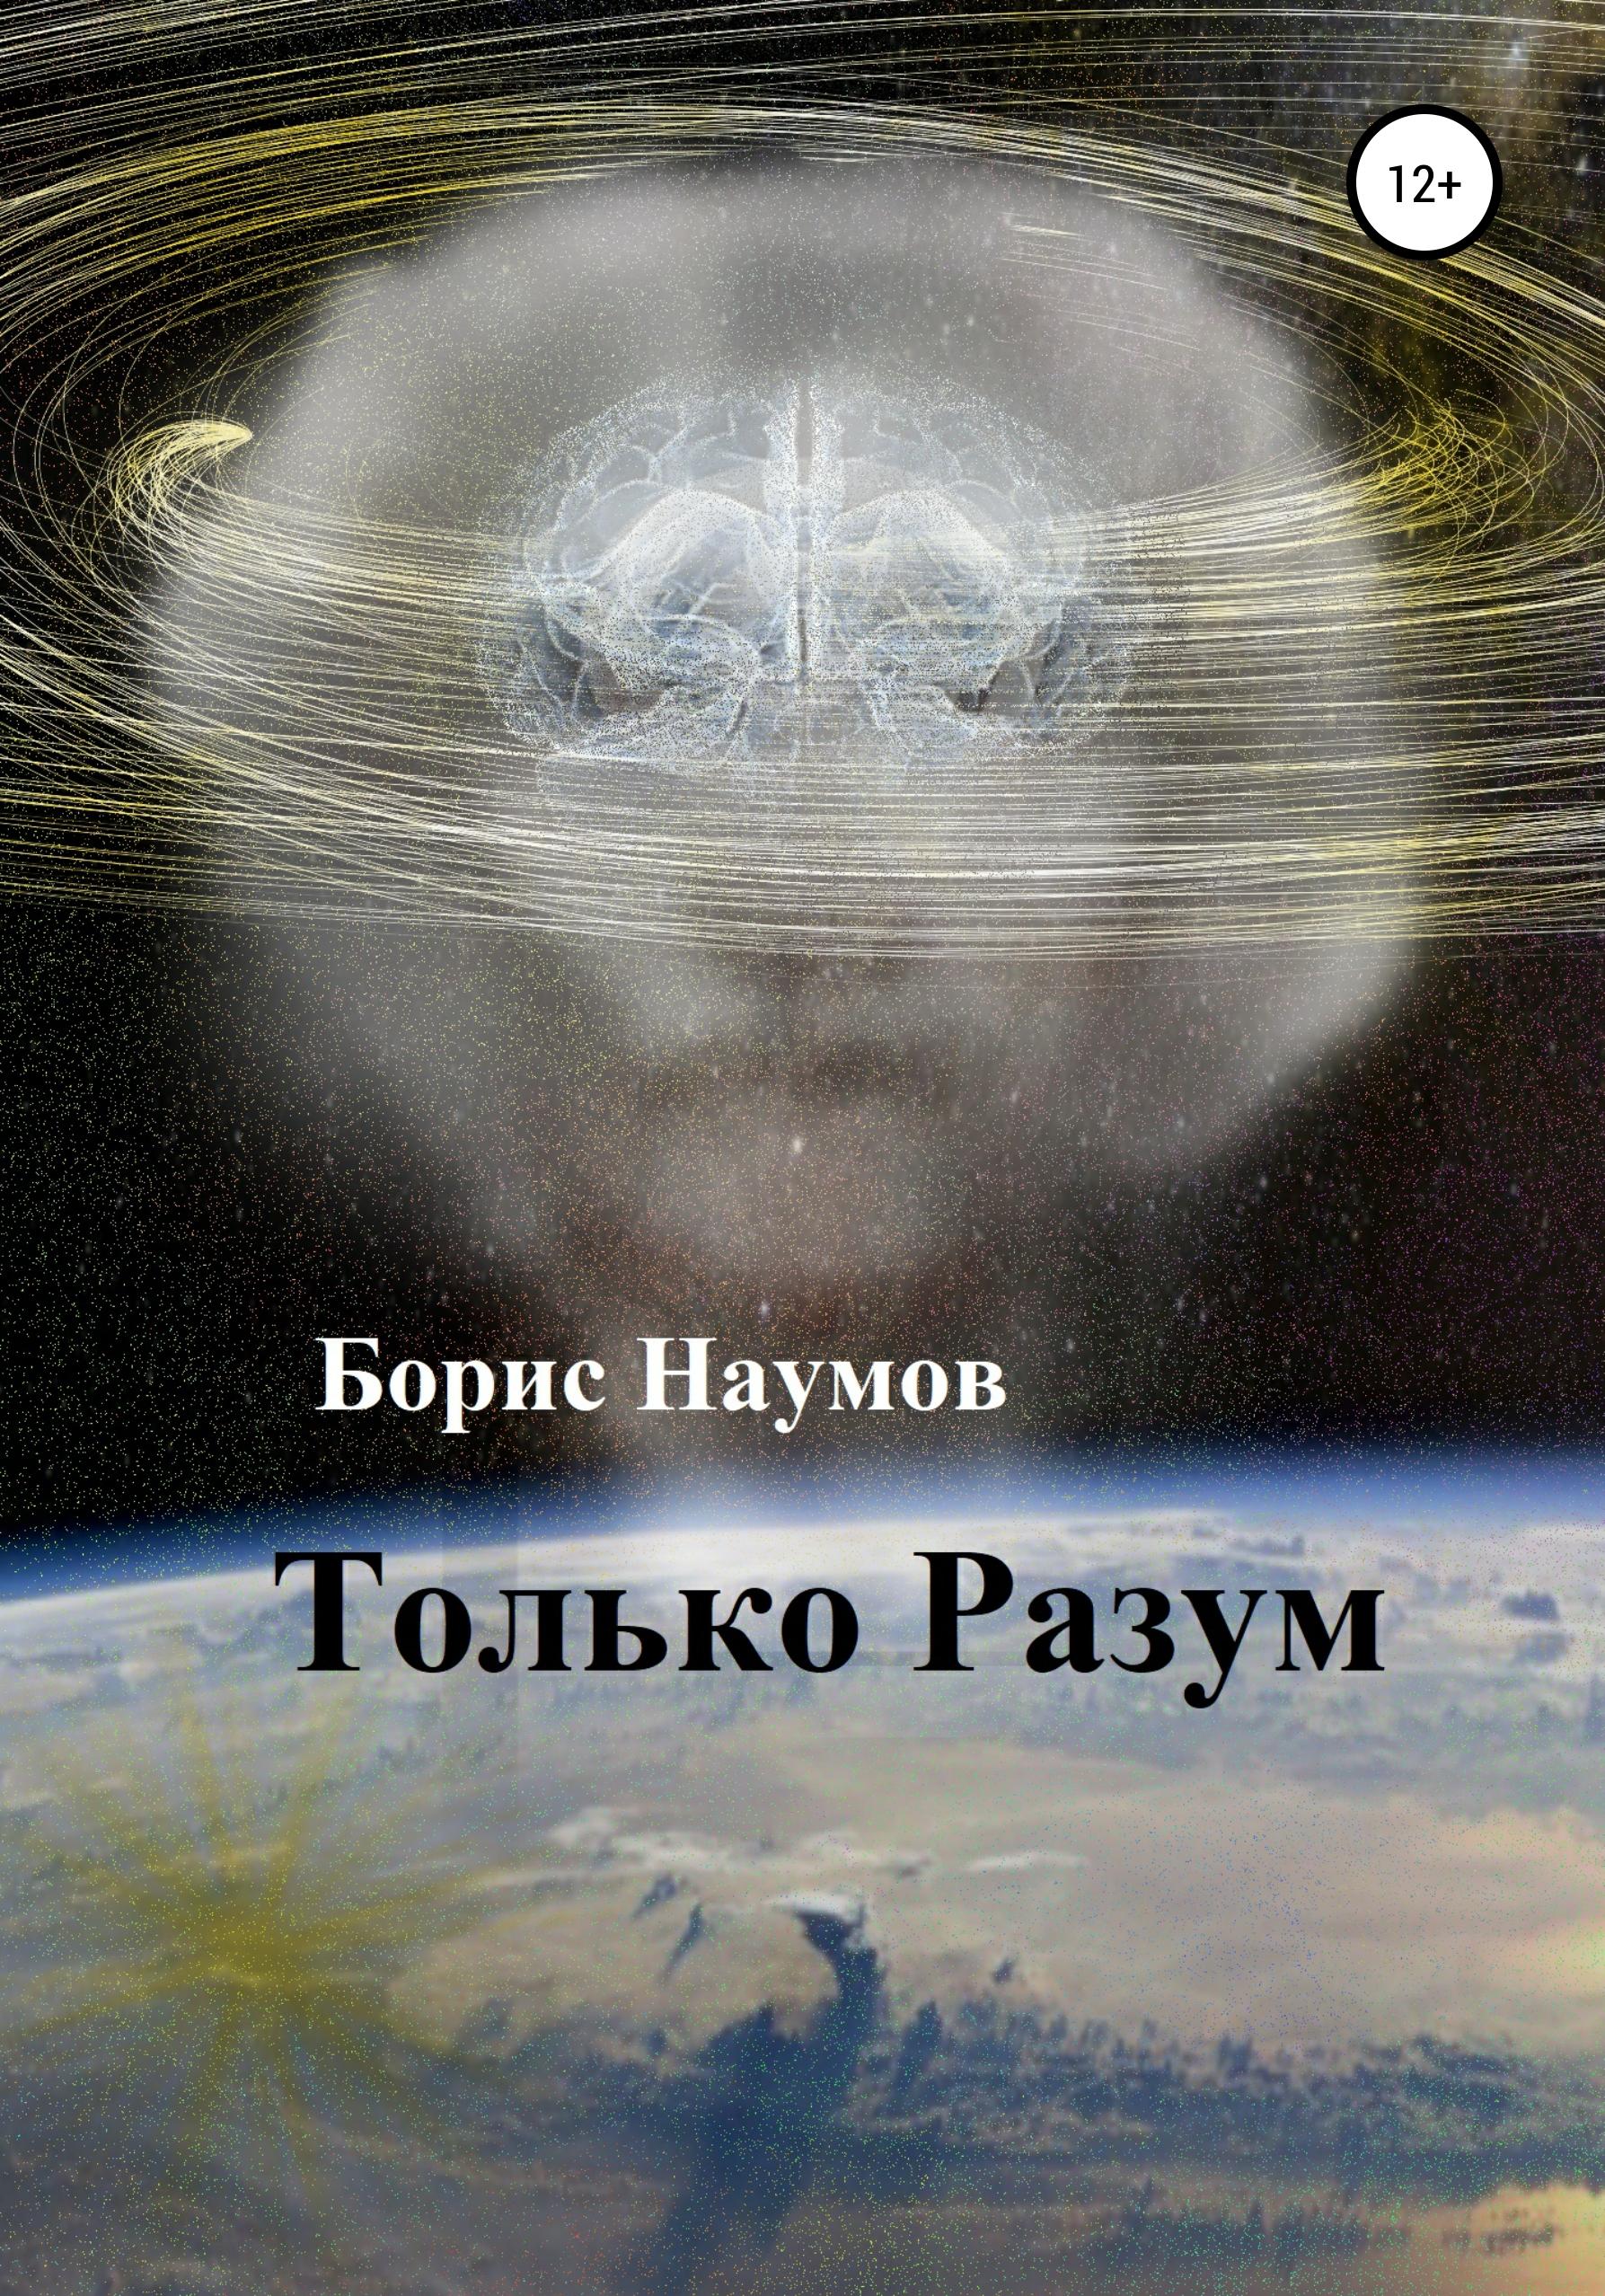 Борис Петрович Наумов Только Разум борис петрович наумов только разум